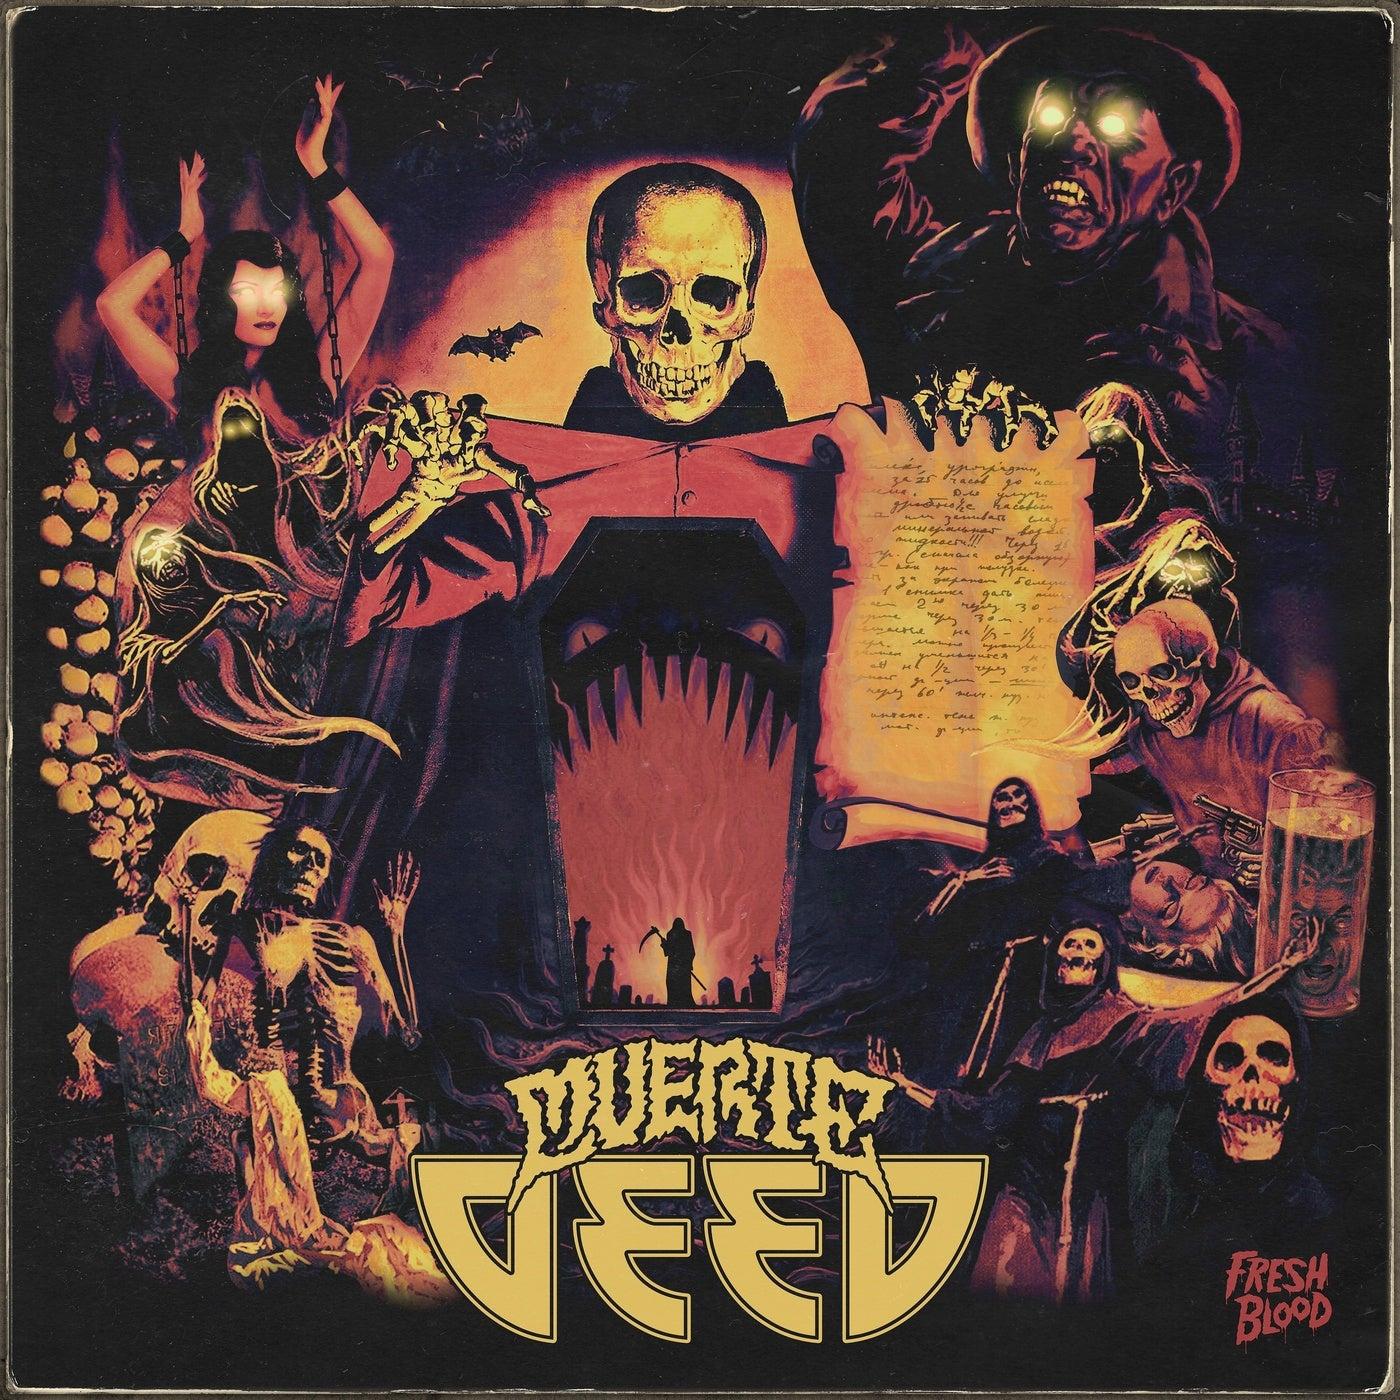 DEED (Original Mix)